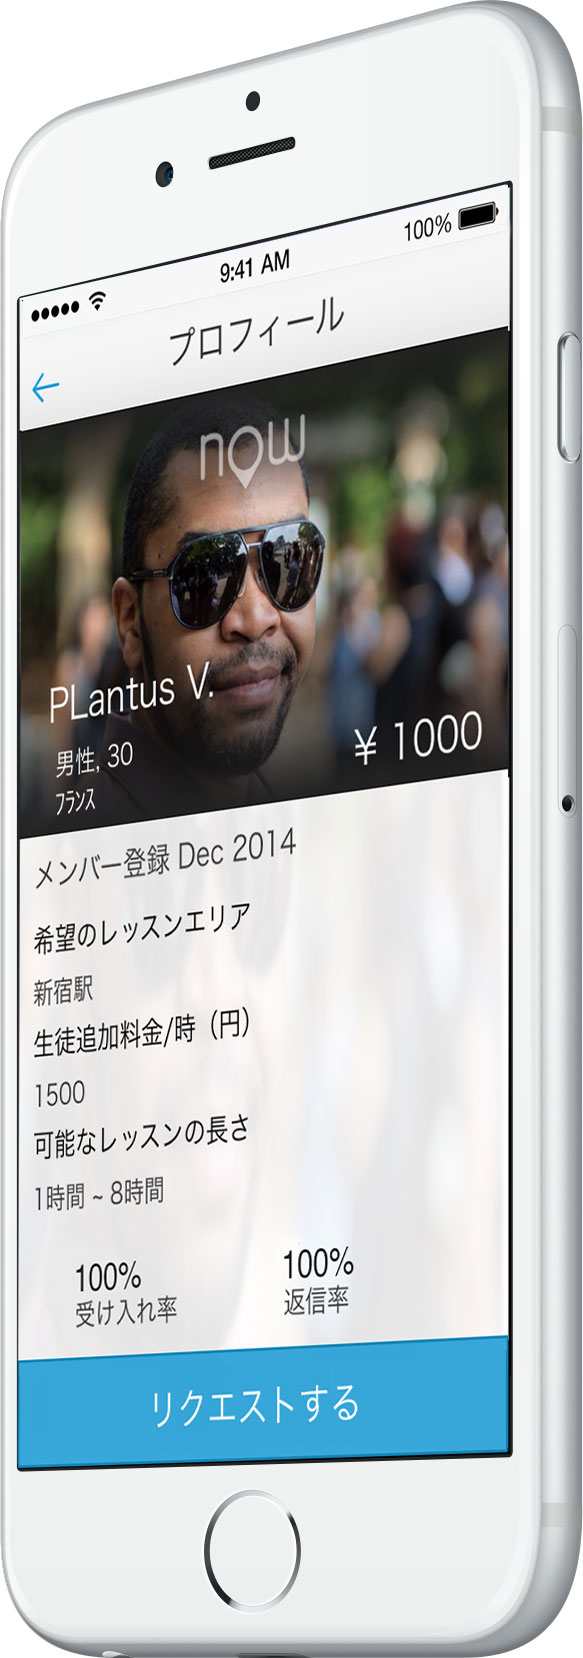 teacher_Plantus_side.jpg